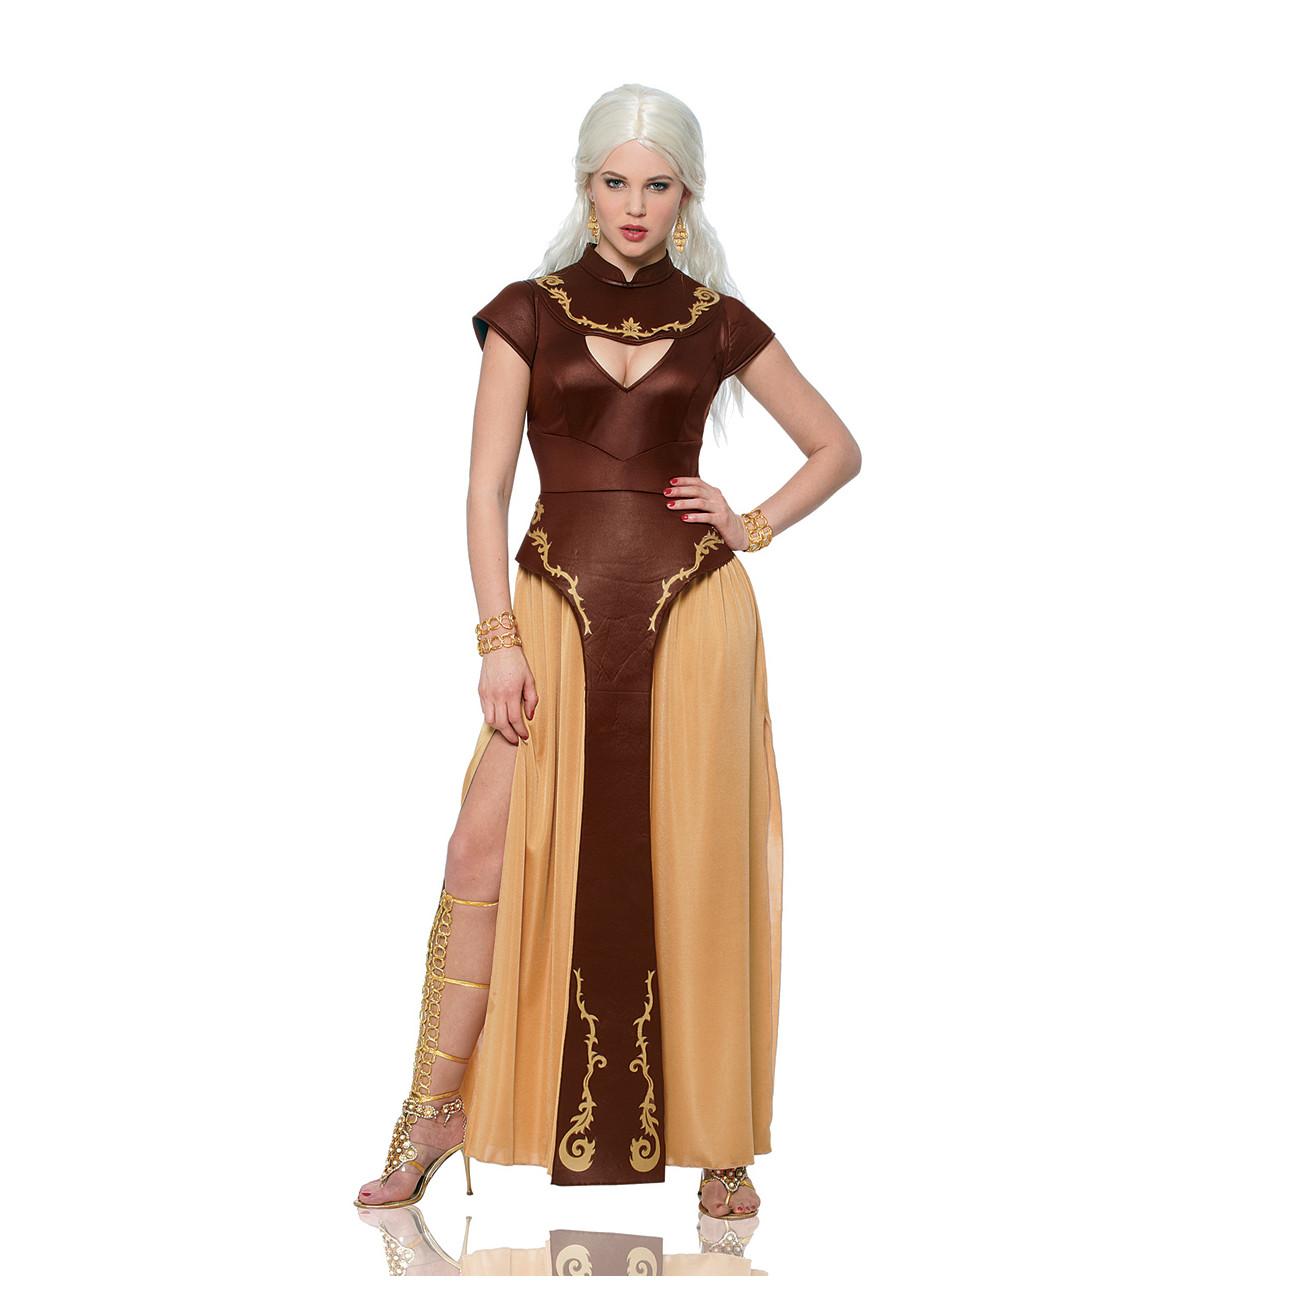 game of thrones choose your costume daenerys jon snow. Black Bedroom Furniture Sets. Home Design Ideas